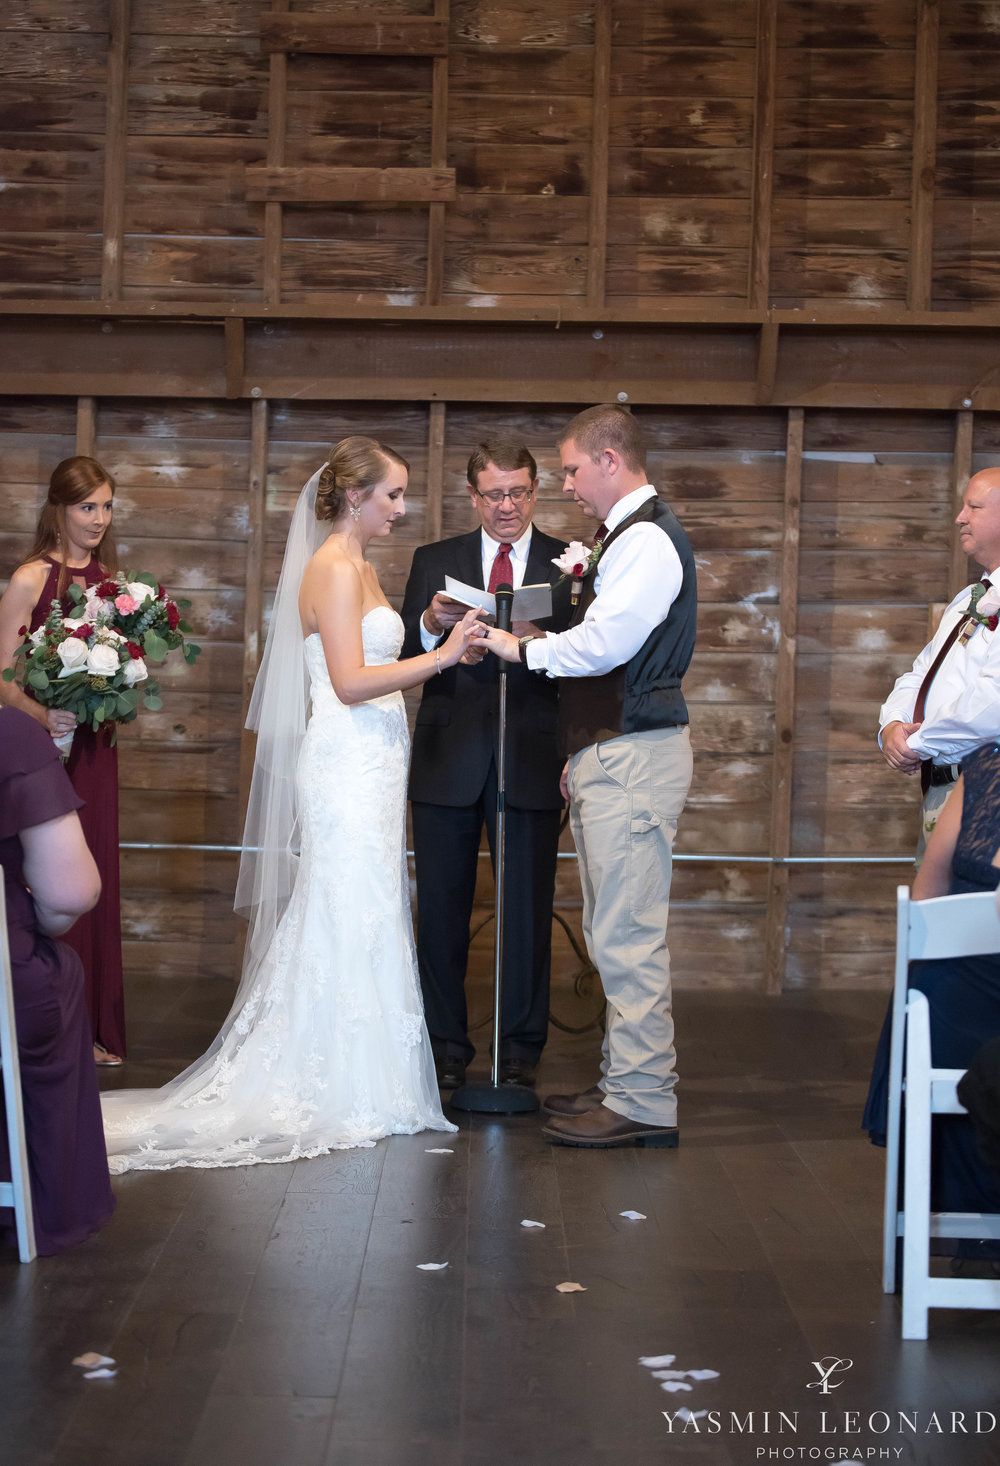 Millikan Farms - NC Wedding Venue - NC Wedding Photographer - Yasmin Leonard Photography - Rain on your wedding day-33.jpg